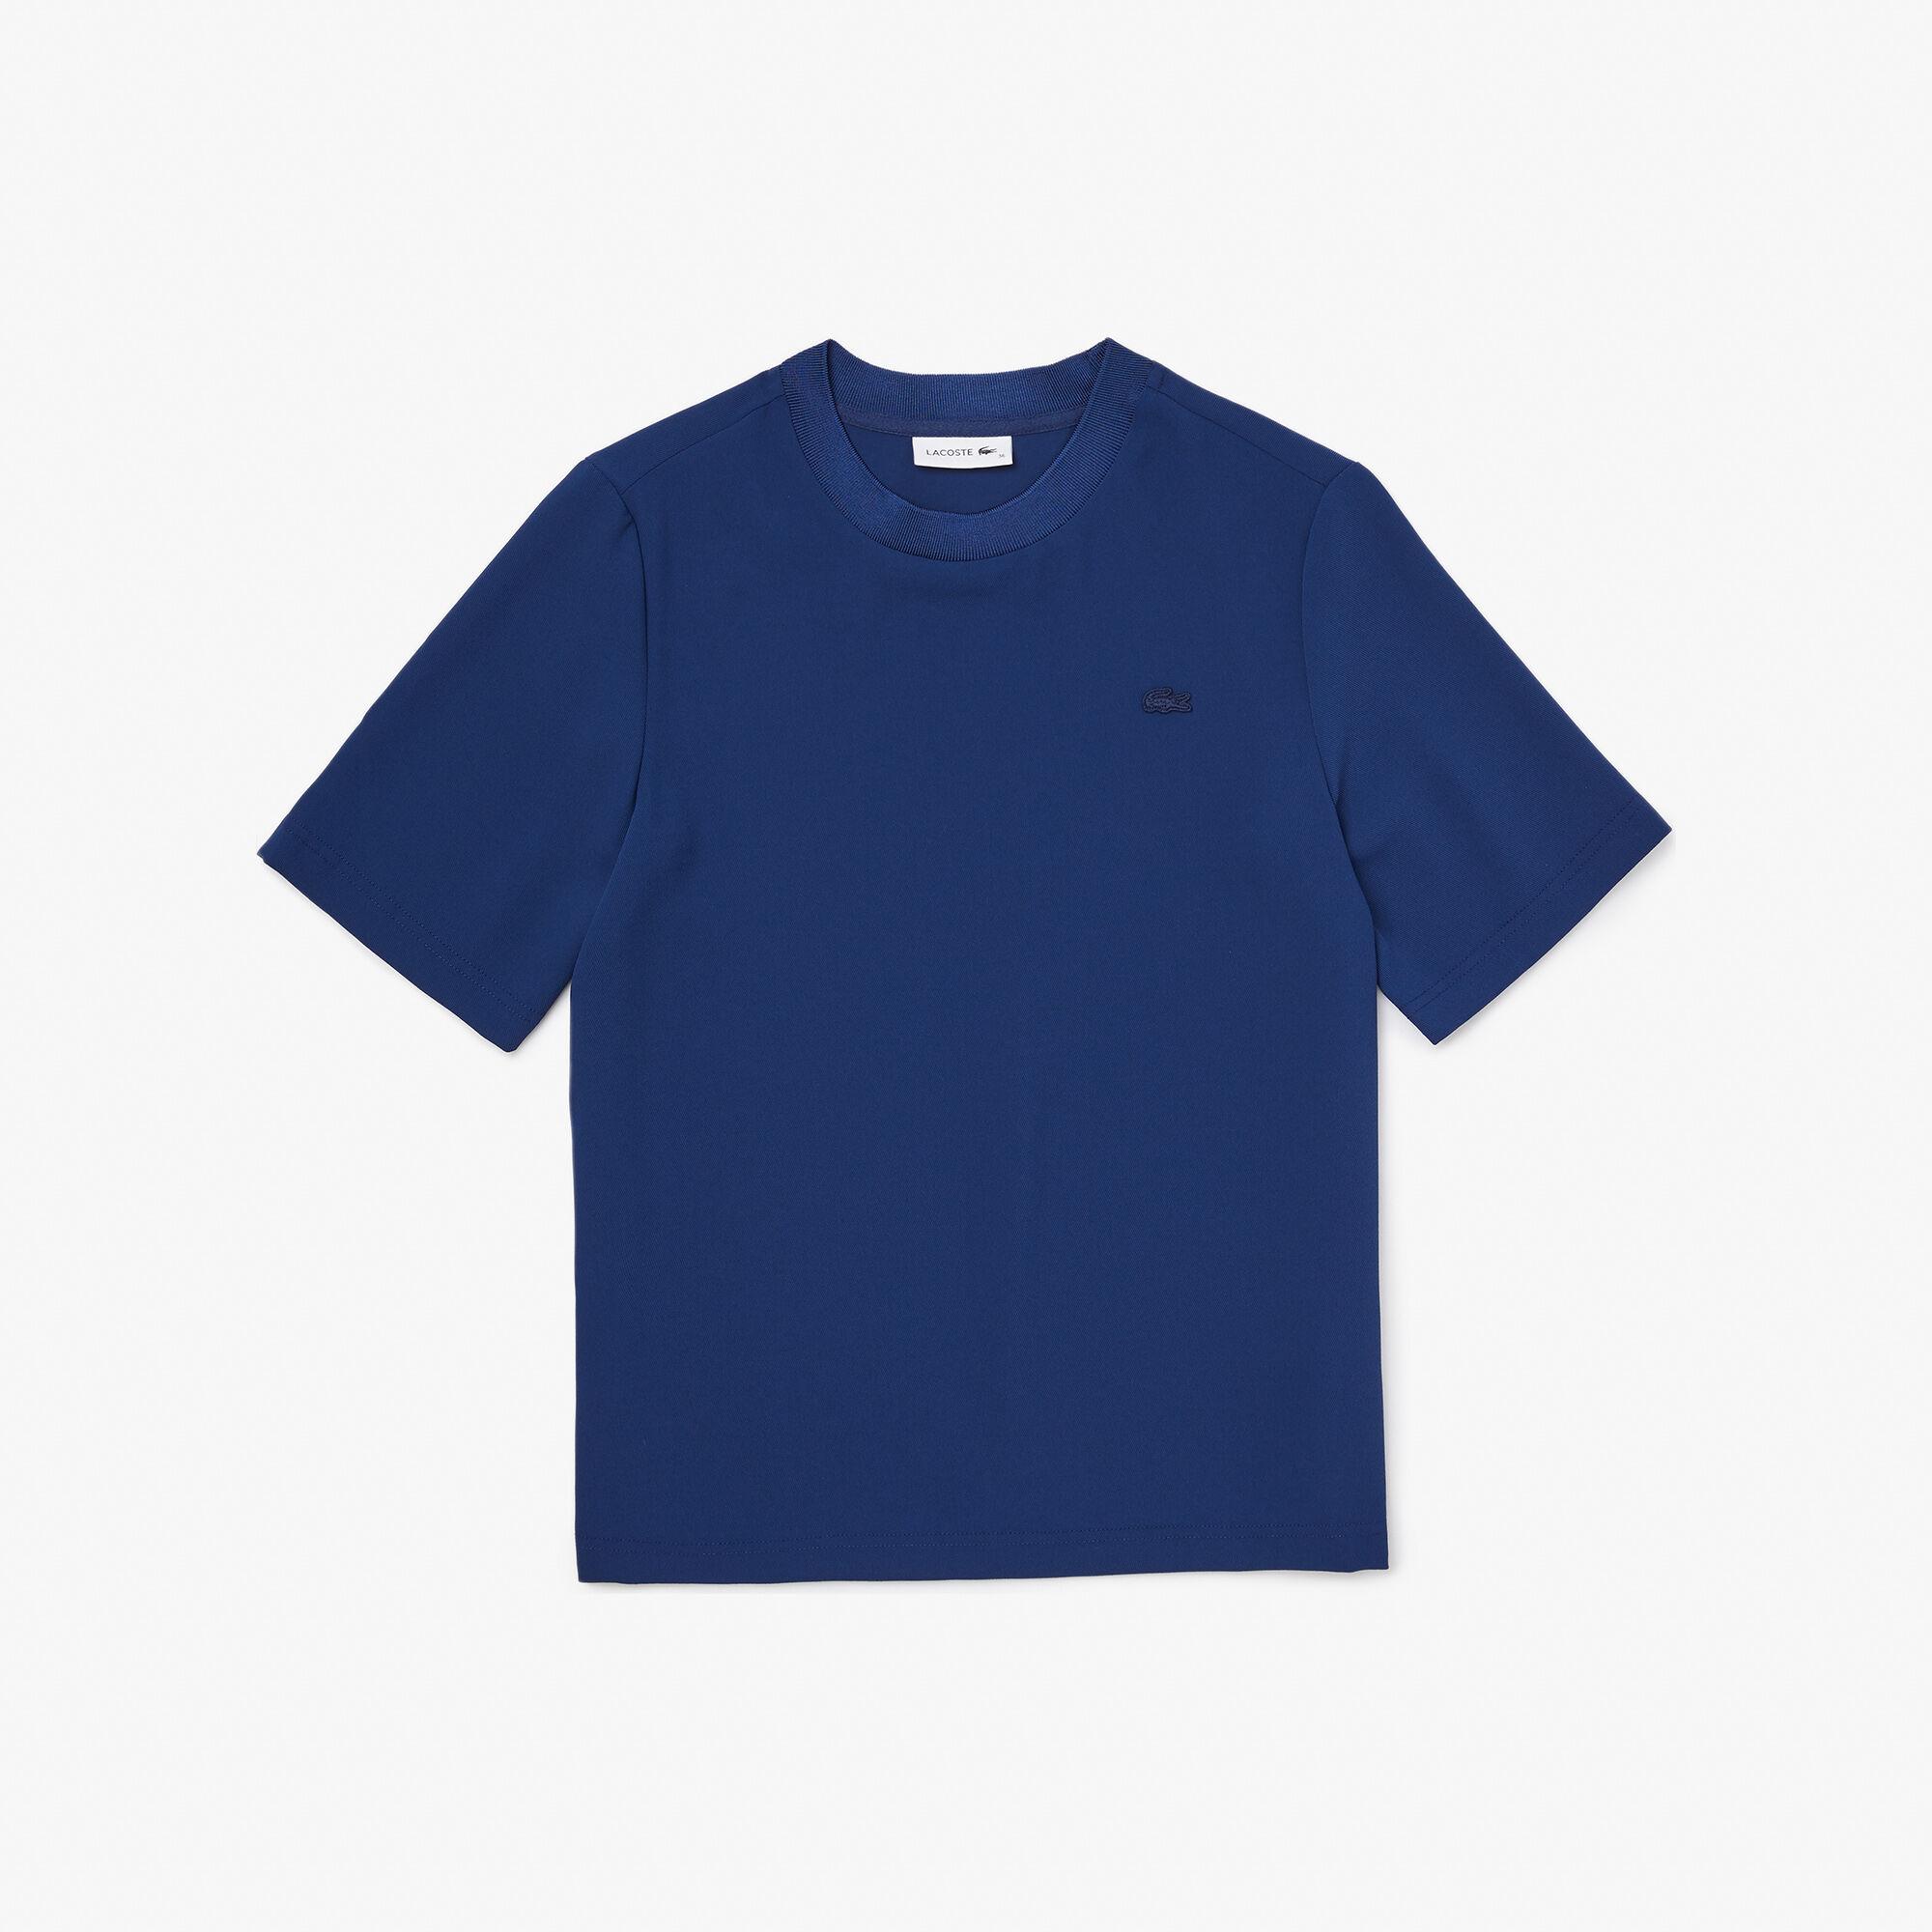 Women's Twill T-shirt